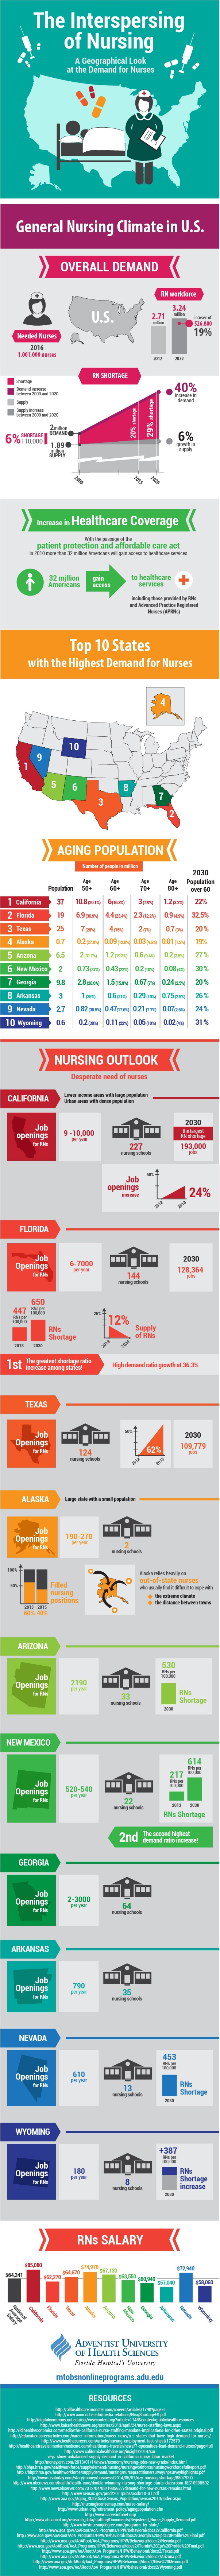 ADU-BSN-The-Interspersing-of-Nursing-Infographic